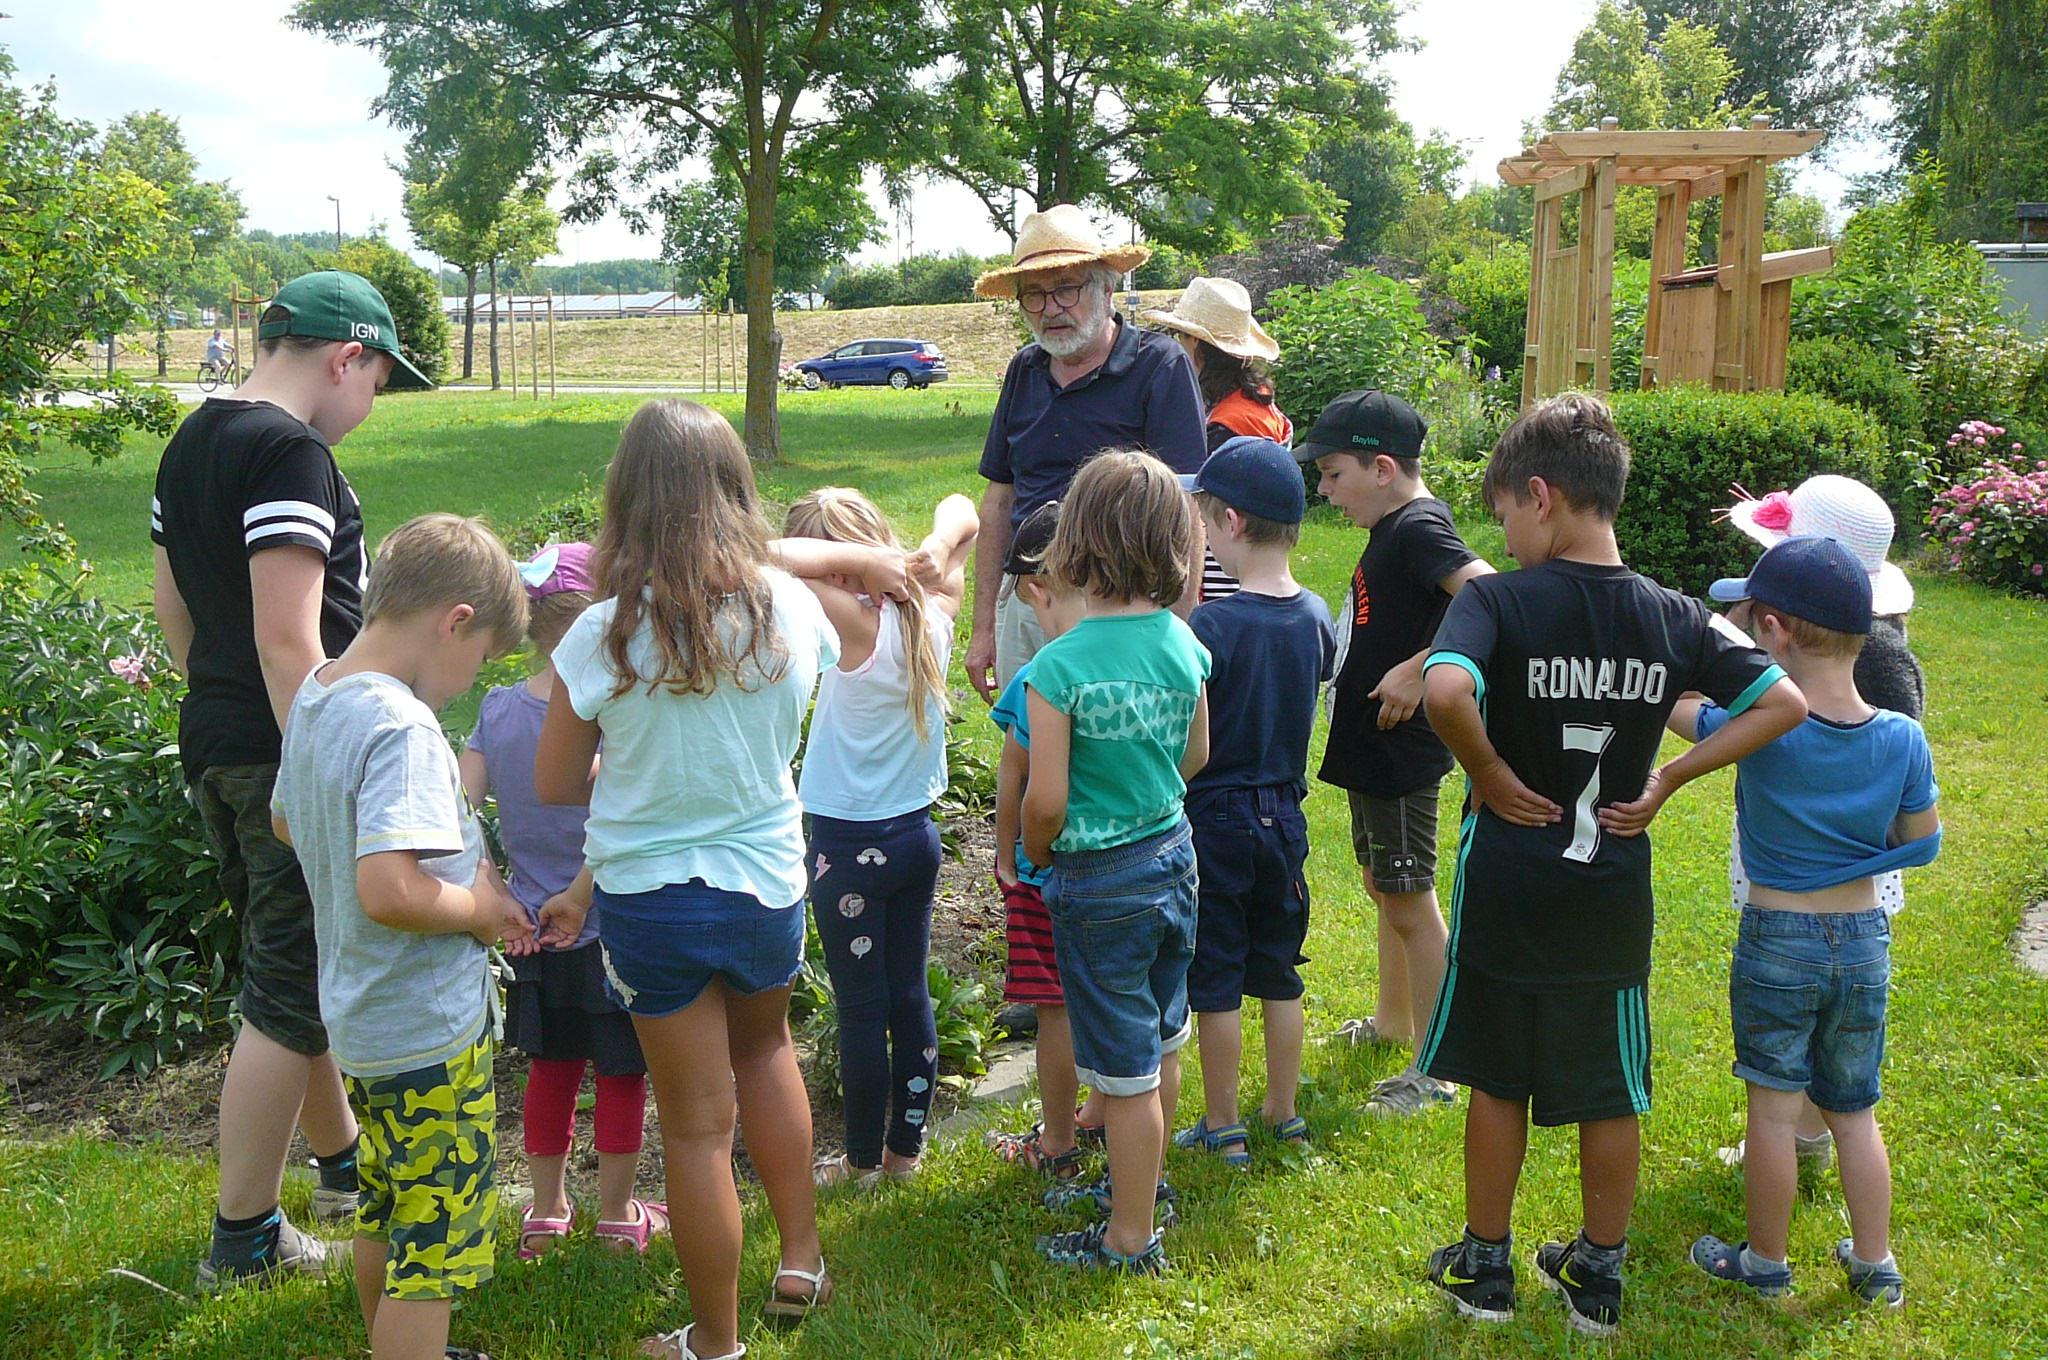 Exkursion mit einem Kräuterexperten, Juni 2018